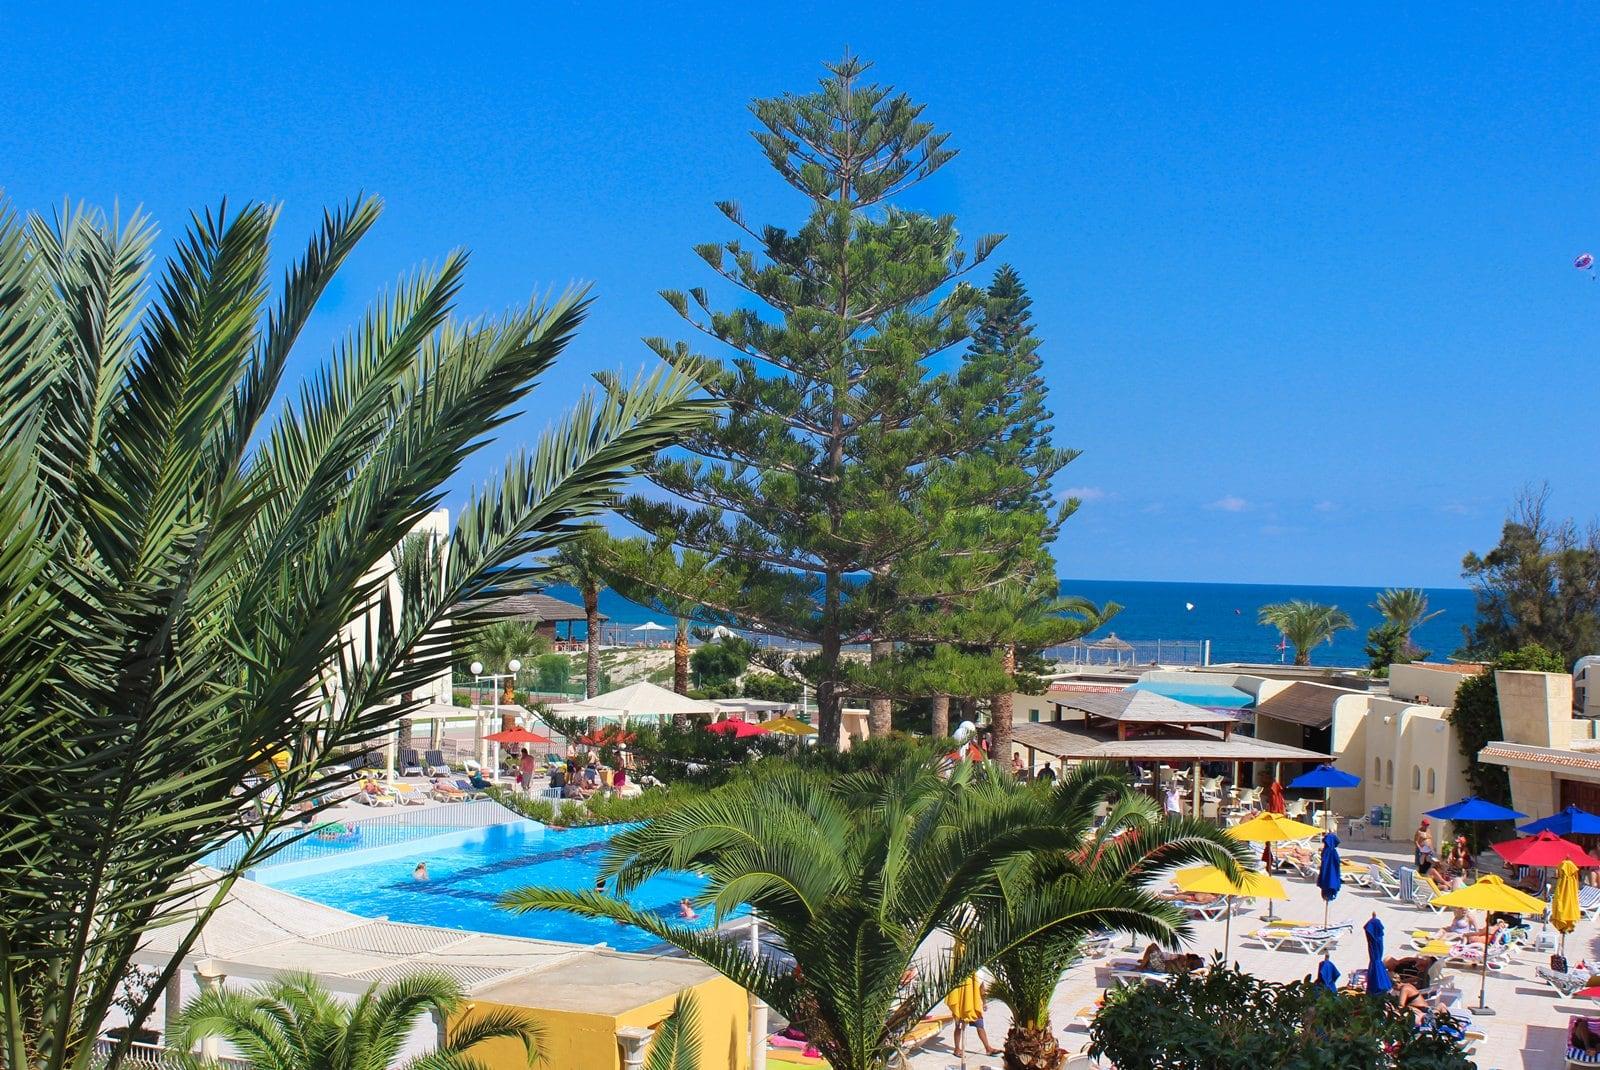 Postcards from Tunisia: Dessole Resort in Port el Kantaoui